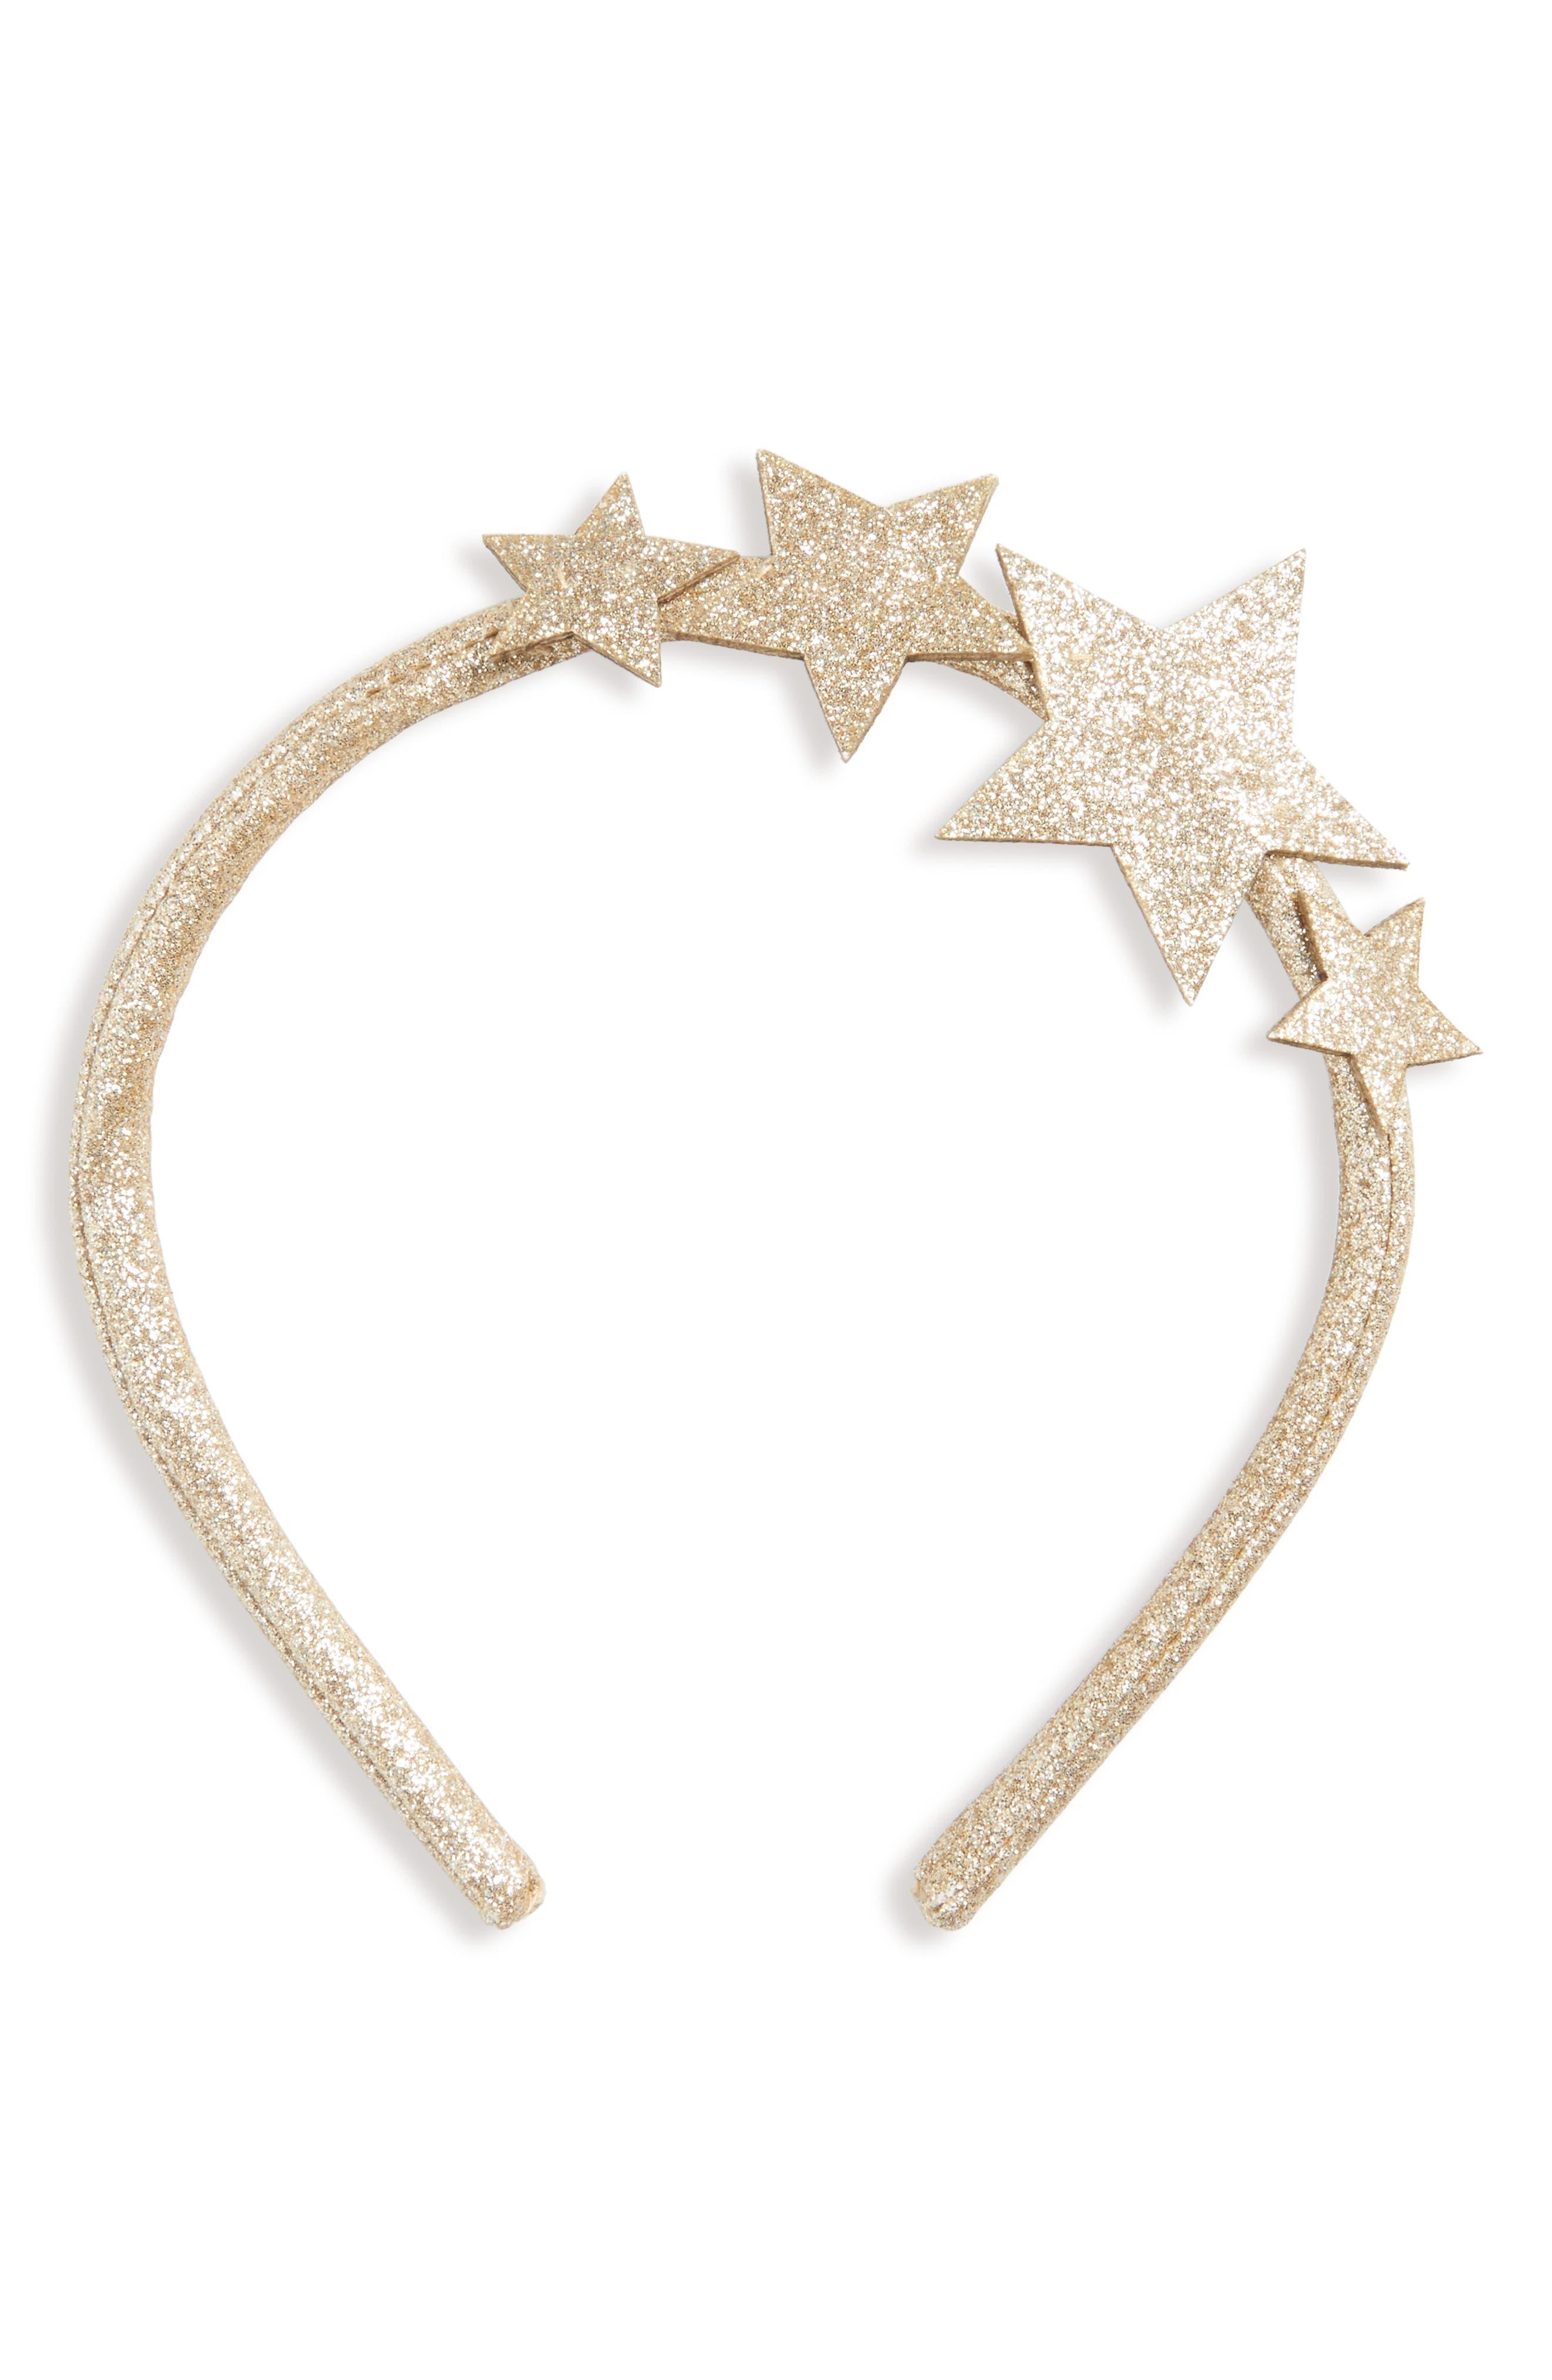 Alternate Image 1 Selected - Wild and Gorgeous Glitter Star Headband (Girls)